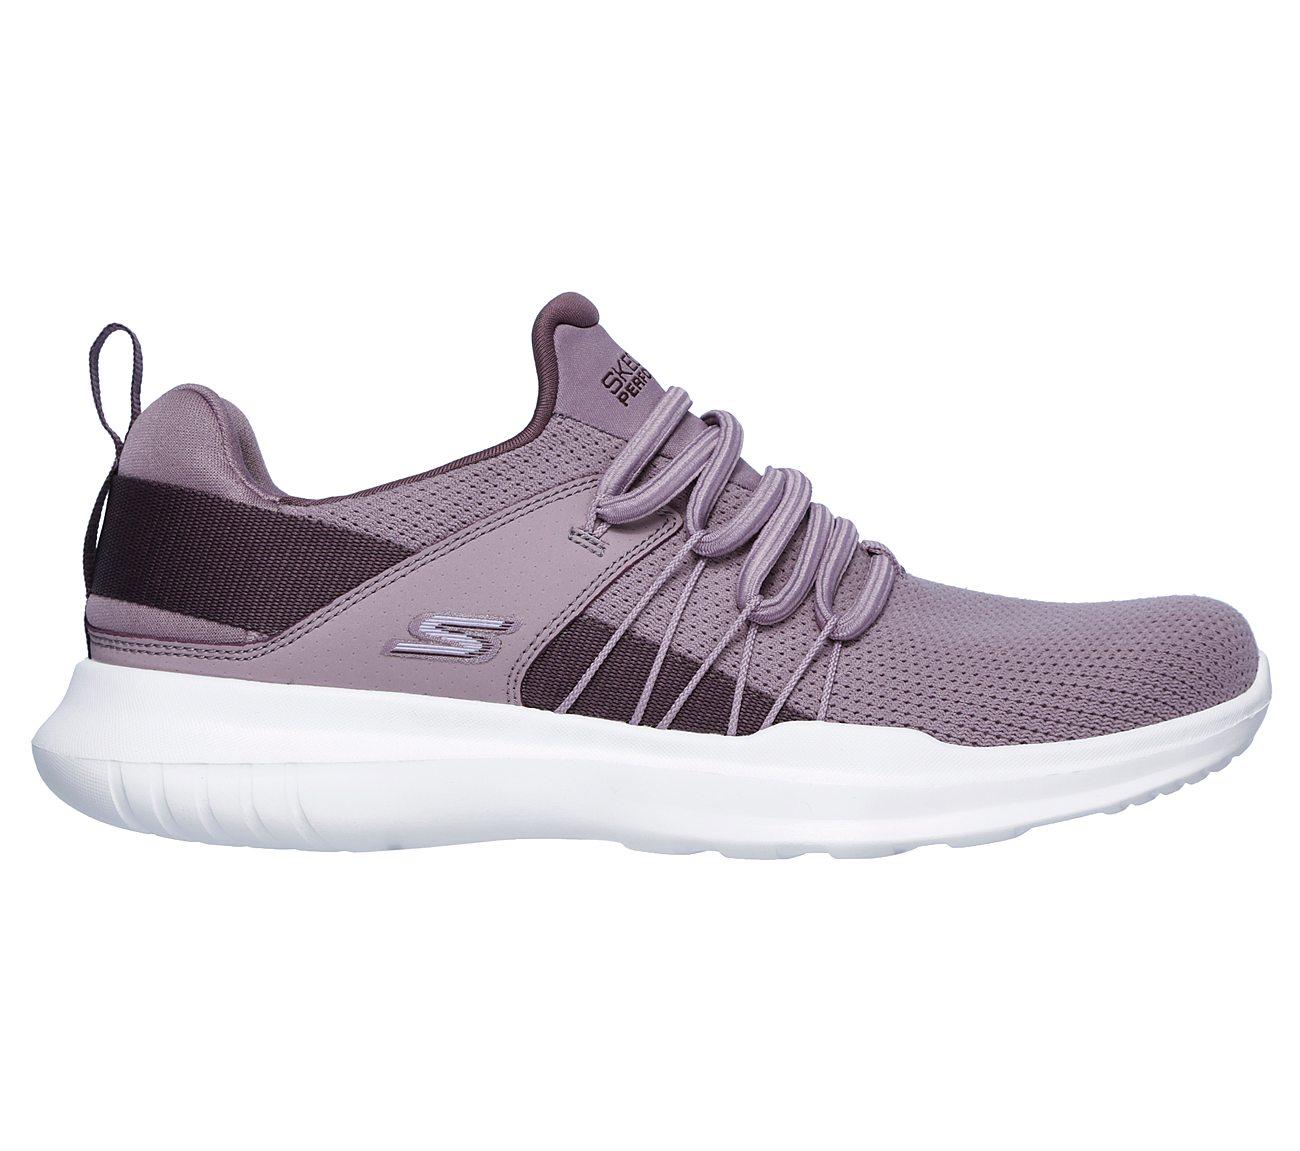 skechers go run womens shoes